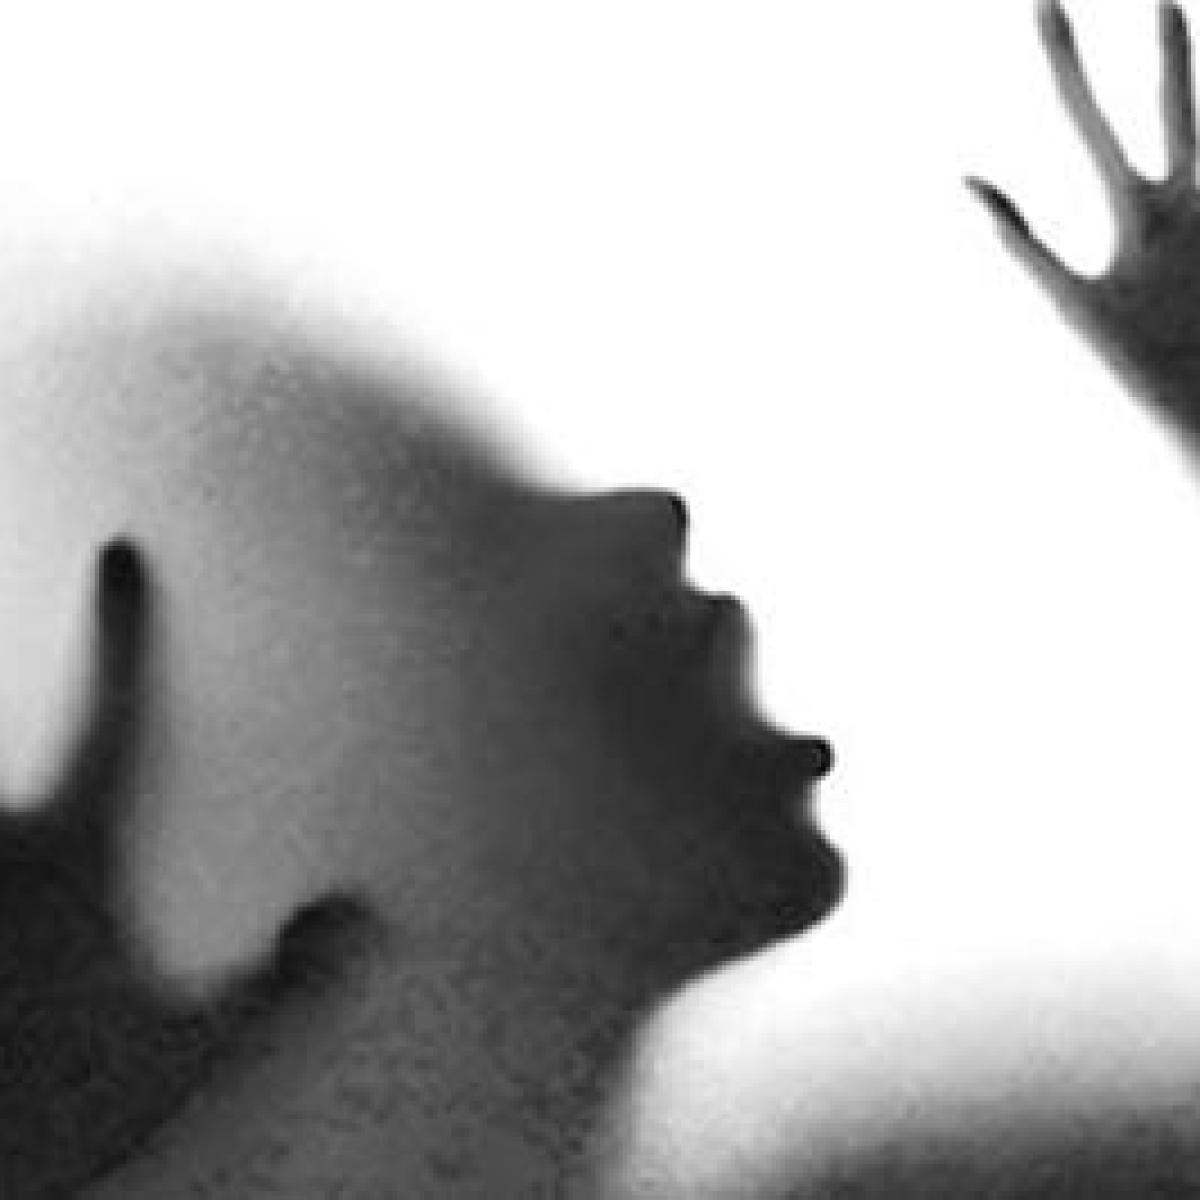 Madhya Pradesh: 7 year old girl raped, her eyes damaged by accused